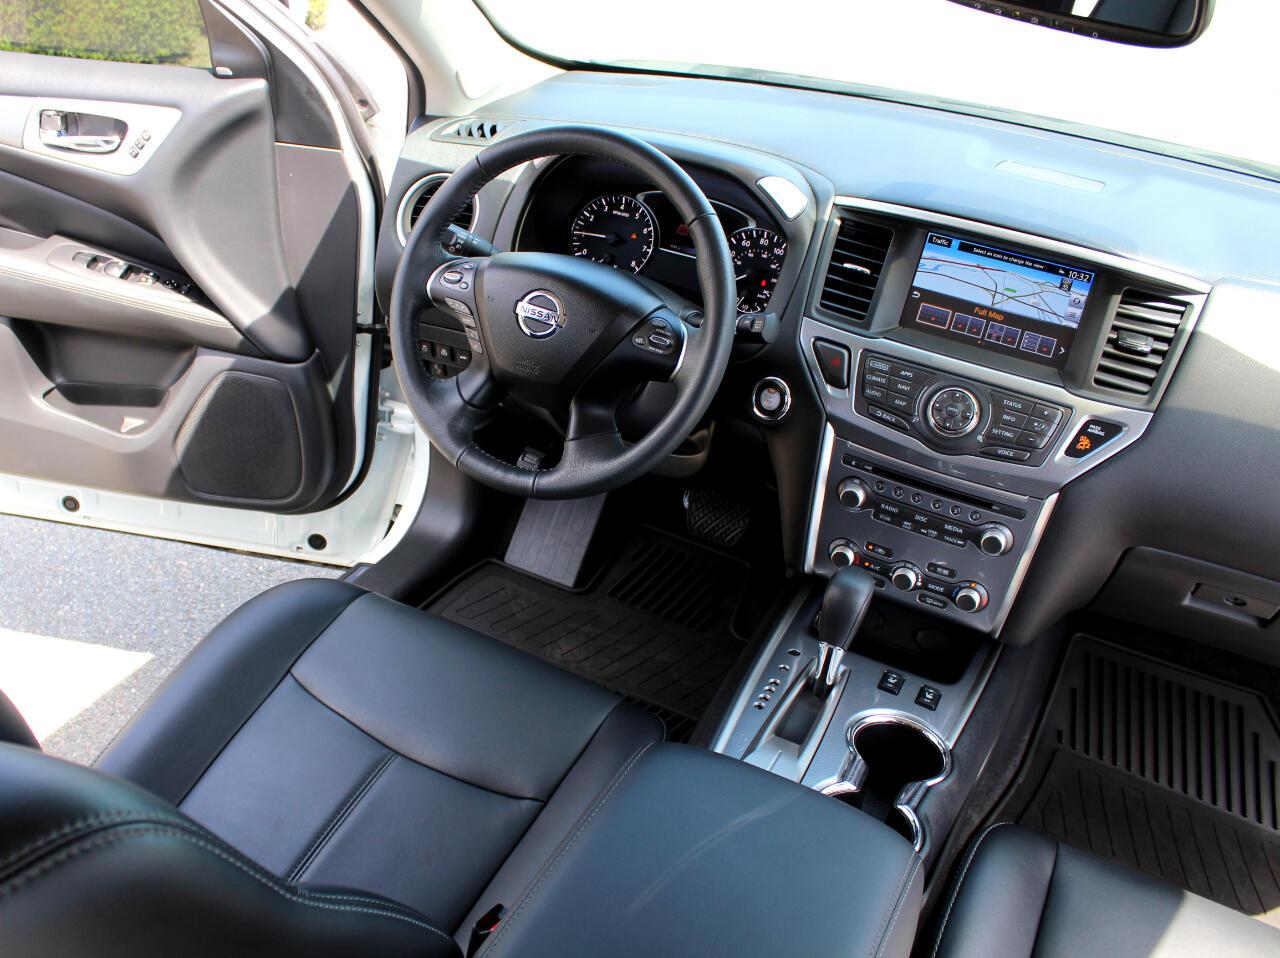 2017 Nissan Pathfinder 2WD 4dr SL